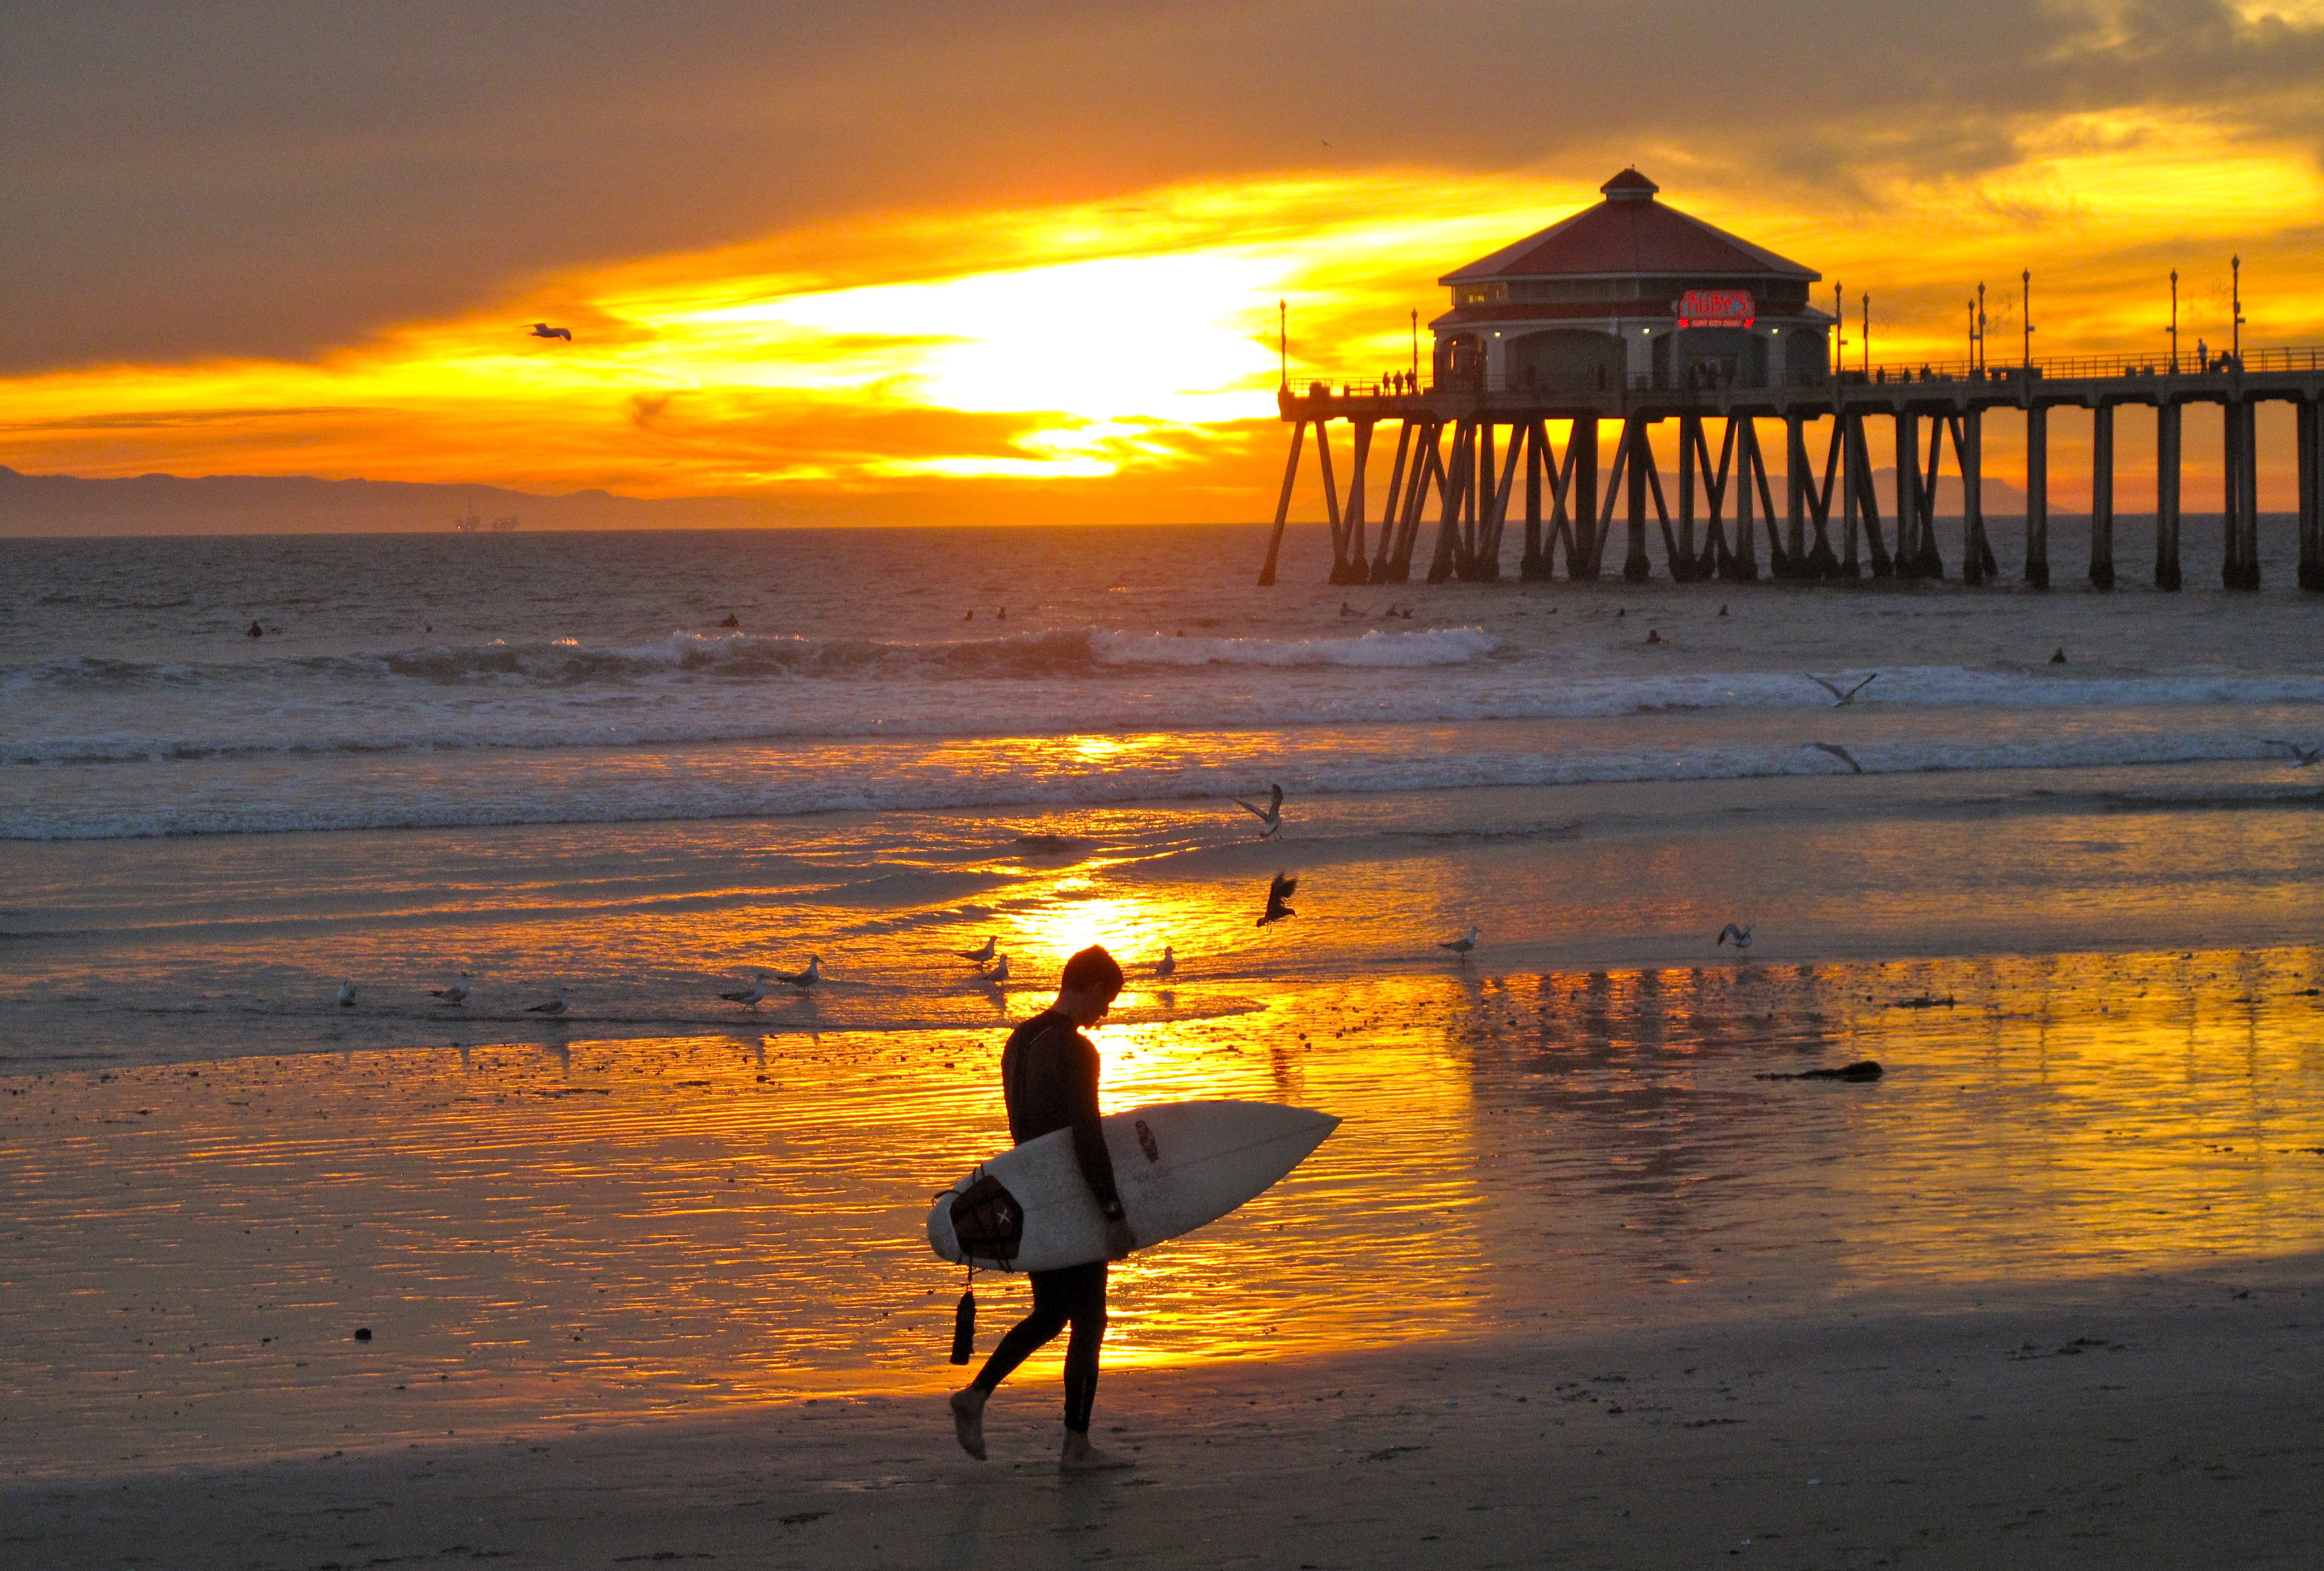 Beach: Surf Huntington Beach City Surfer Usa Sunset Pier Lone ...